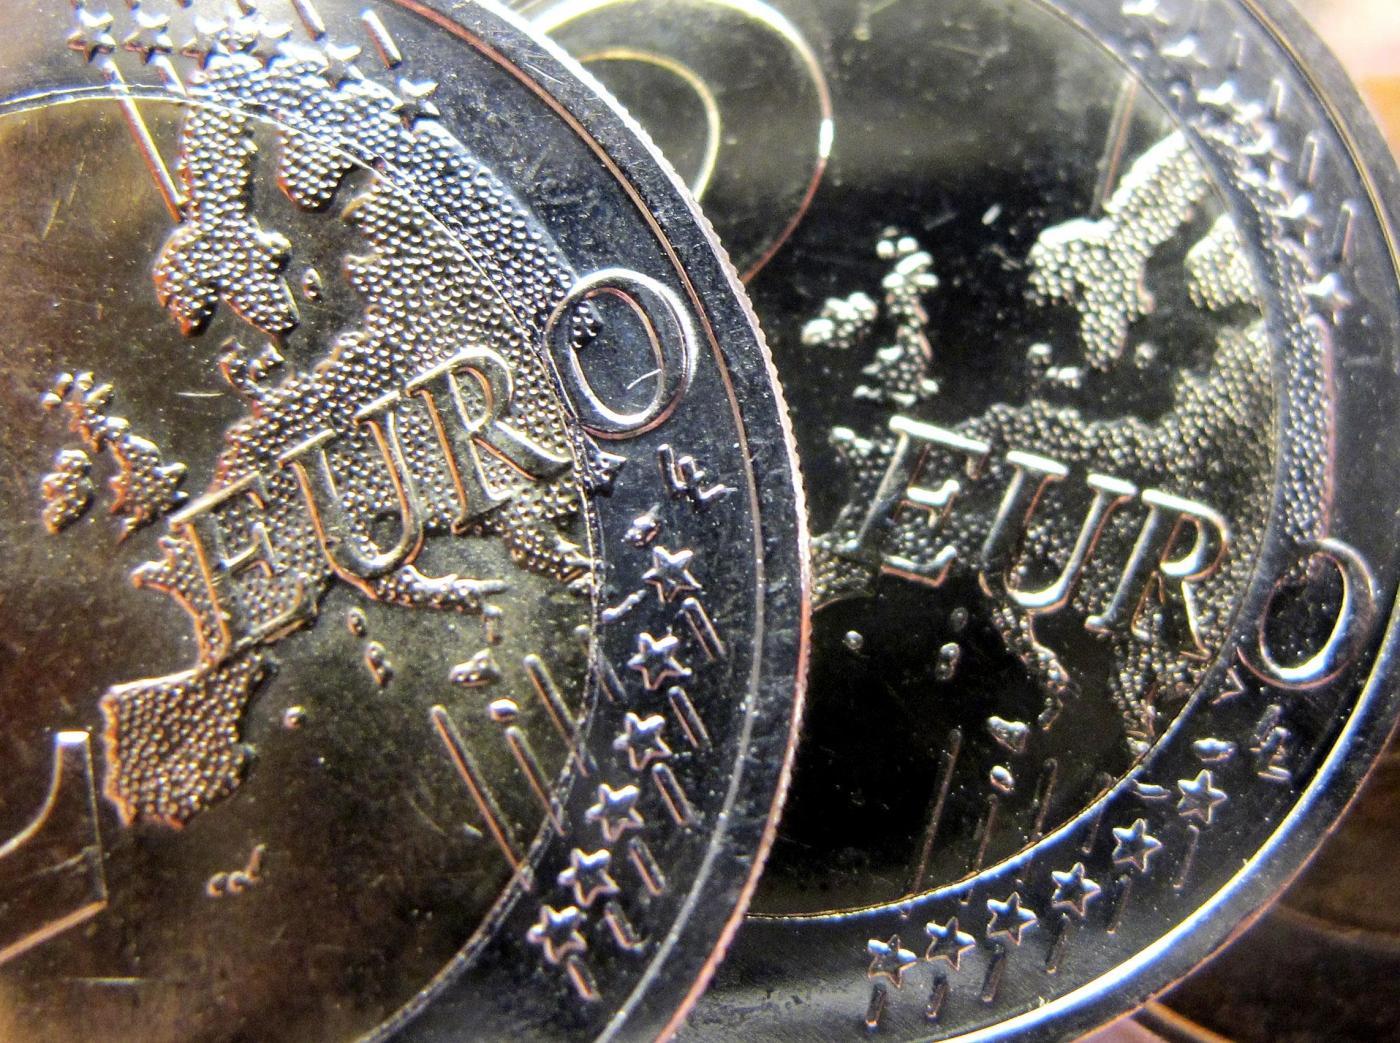 euro falsi made in china sequestrate monete da 1. Black Bedroom Furniture Sets. Home Design Ideas